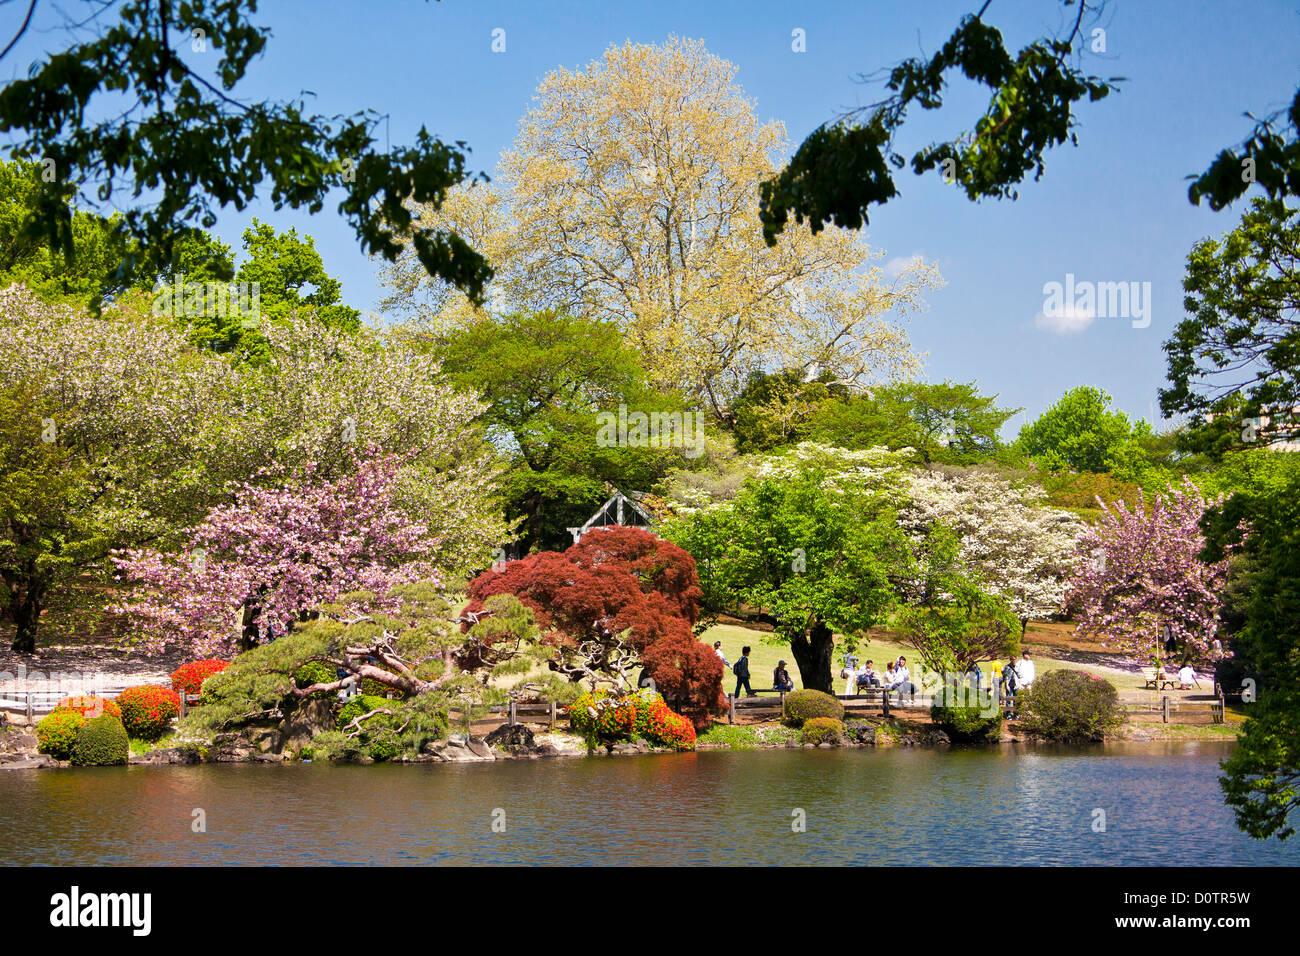 Le Japon, Asie, vacances, voyage, Ville, Tokyo, shinjuku, Shinjuku Gyoen, District,, Jardin, parc, étang, printemps Photo Stock